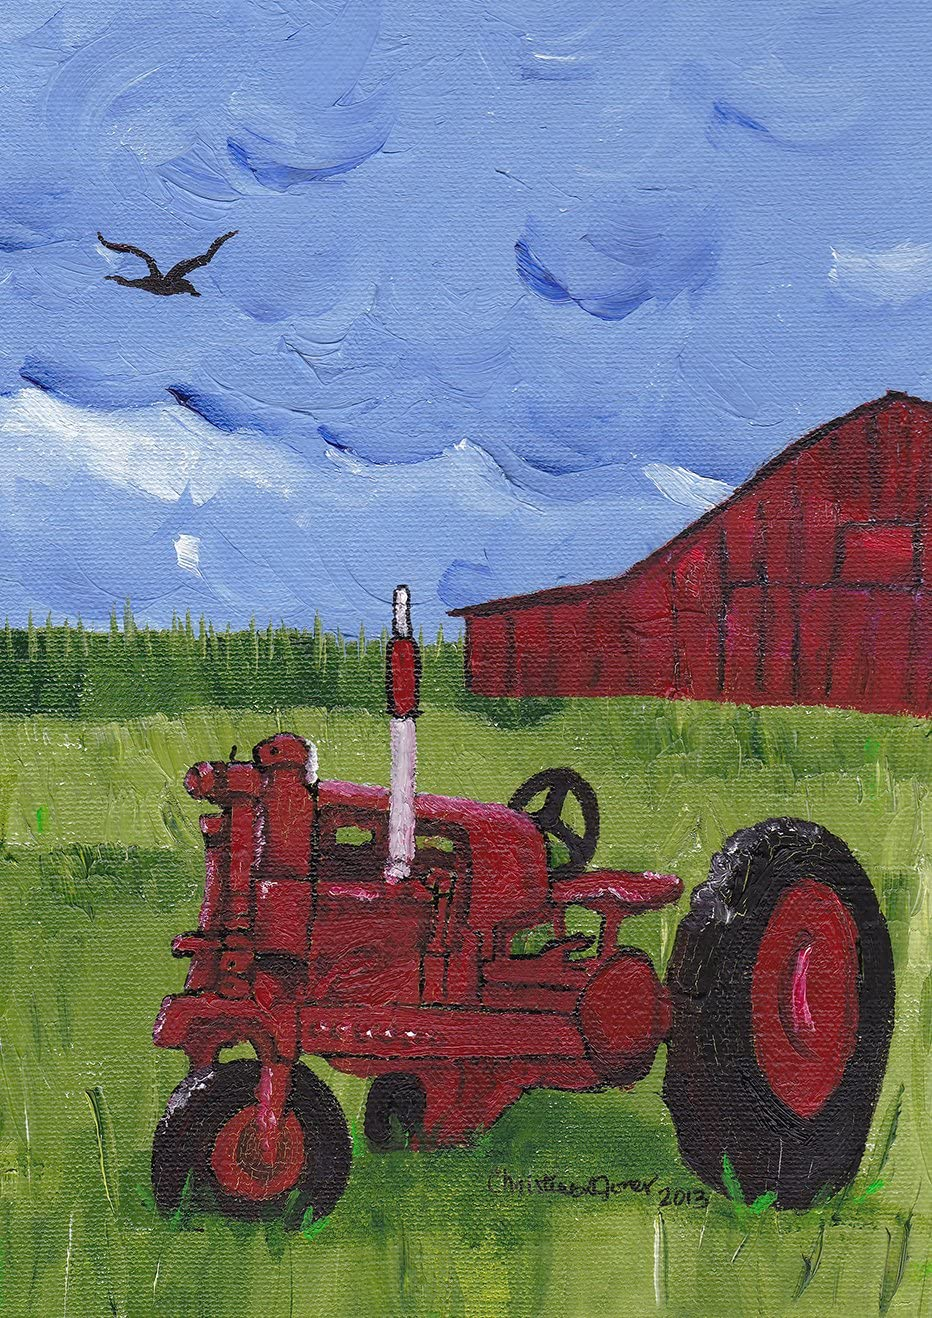 Toland Home Garden Red Tractor 12.5 x 18 Inch Decorative Farm Barn Painting Garden Flag